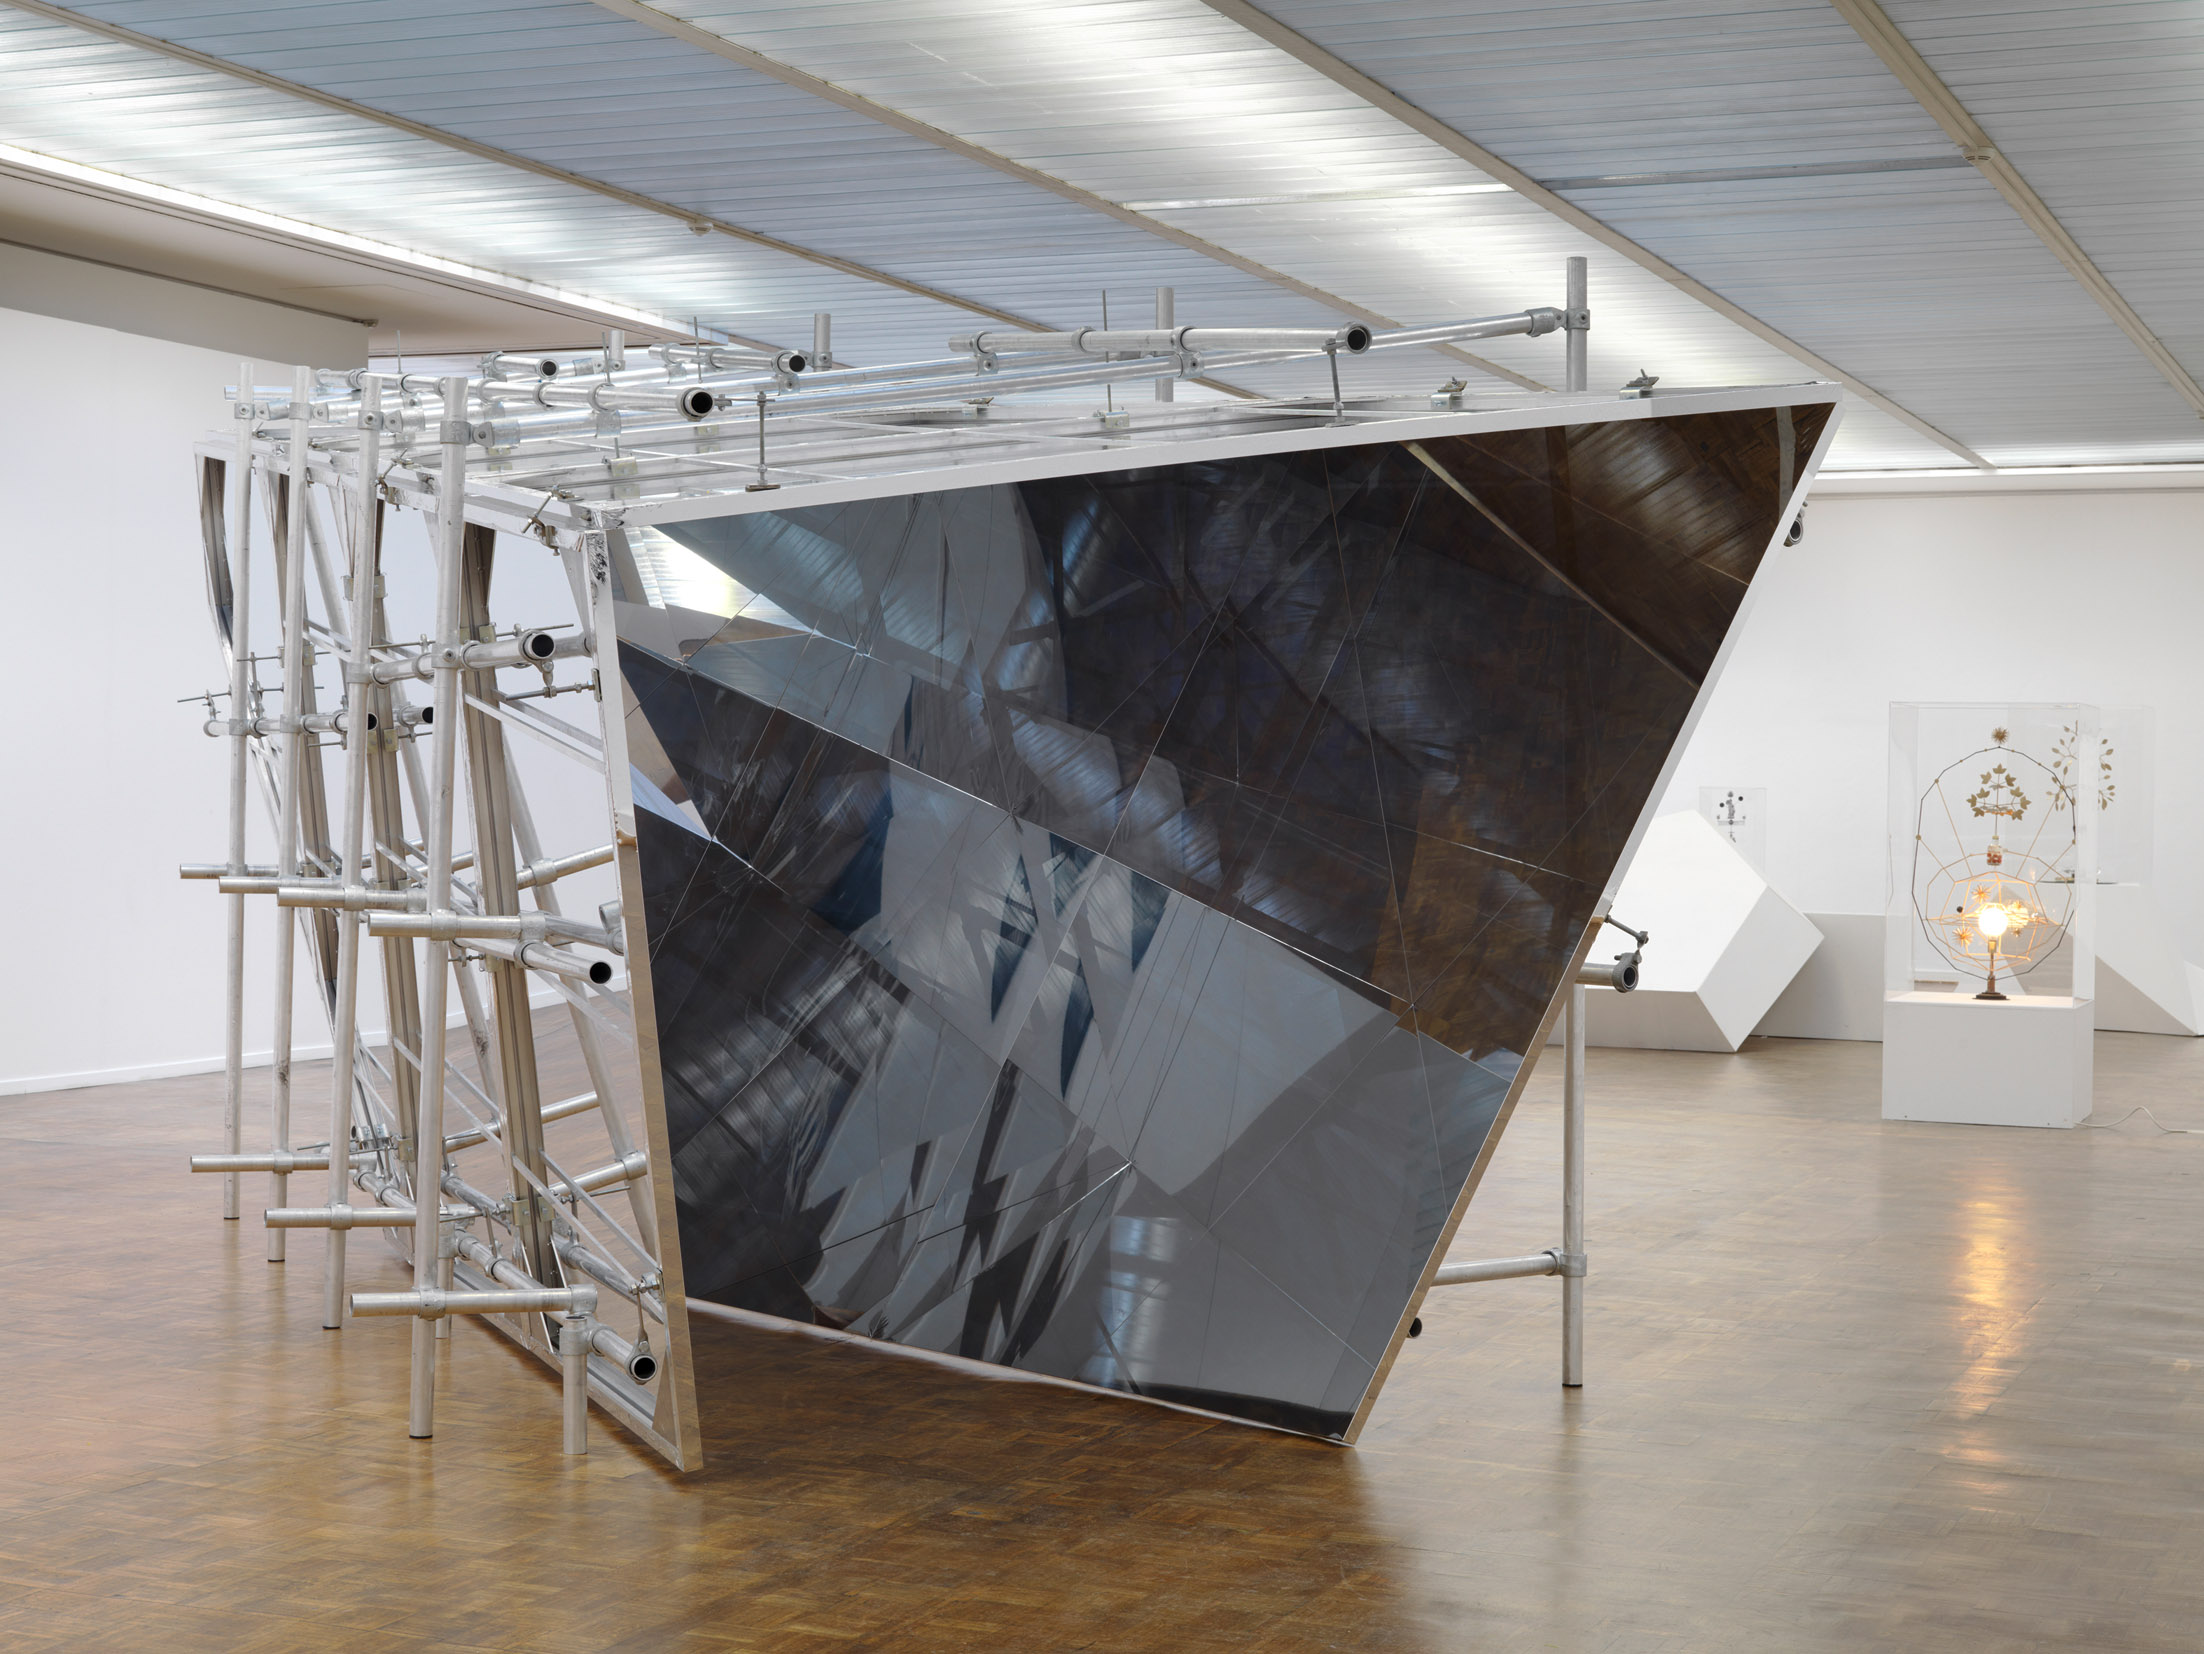 Olafur Eliasson, Ausstellungsansicht Kunsthalle Rostock, Foto: Bernd Borchardt